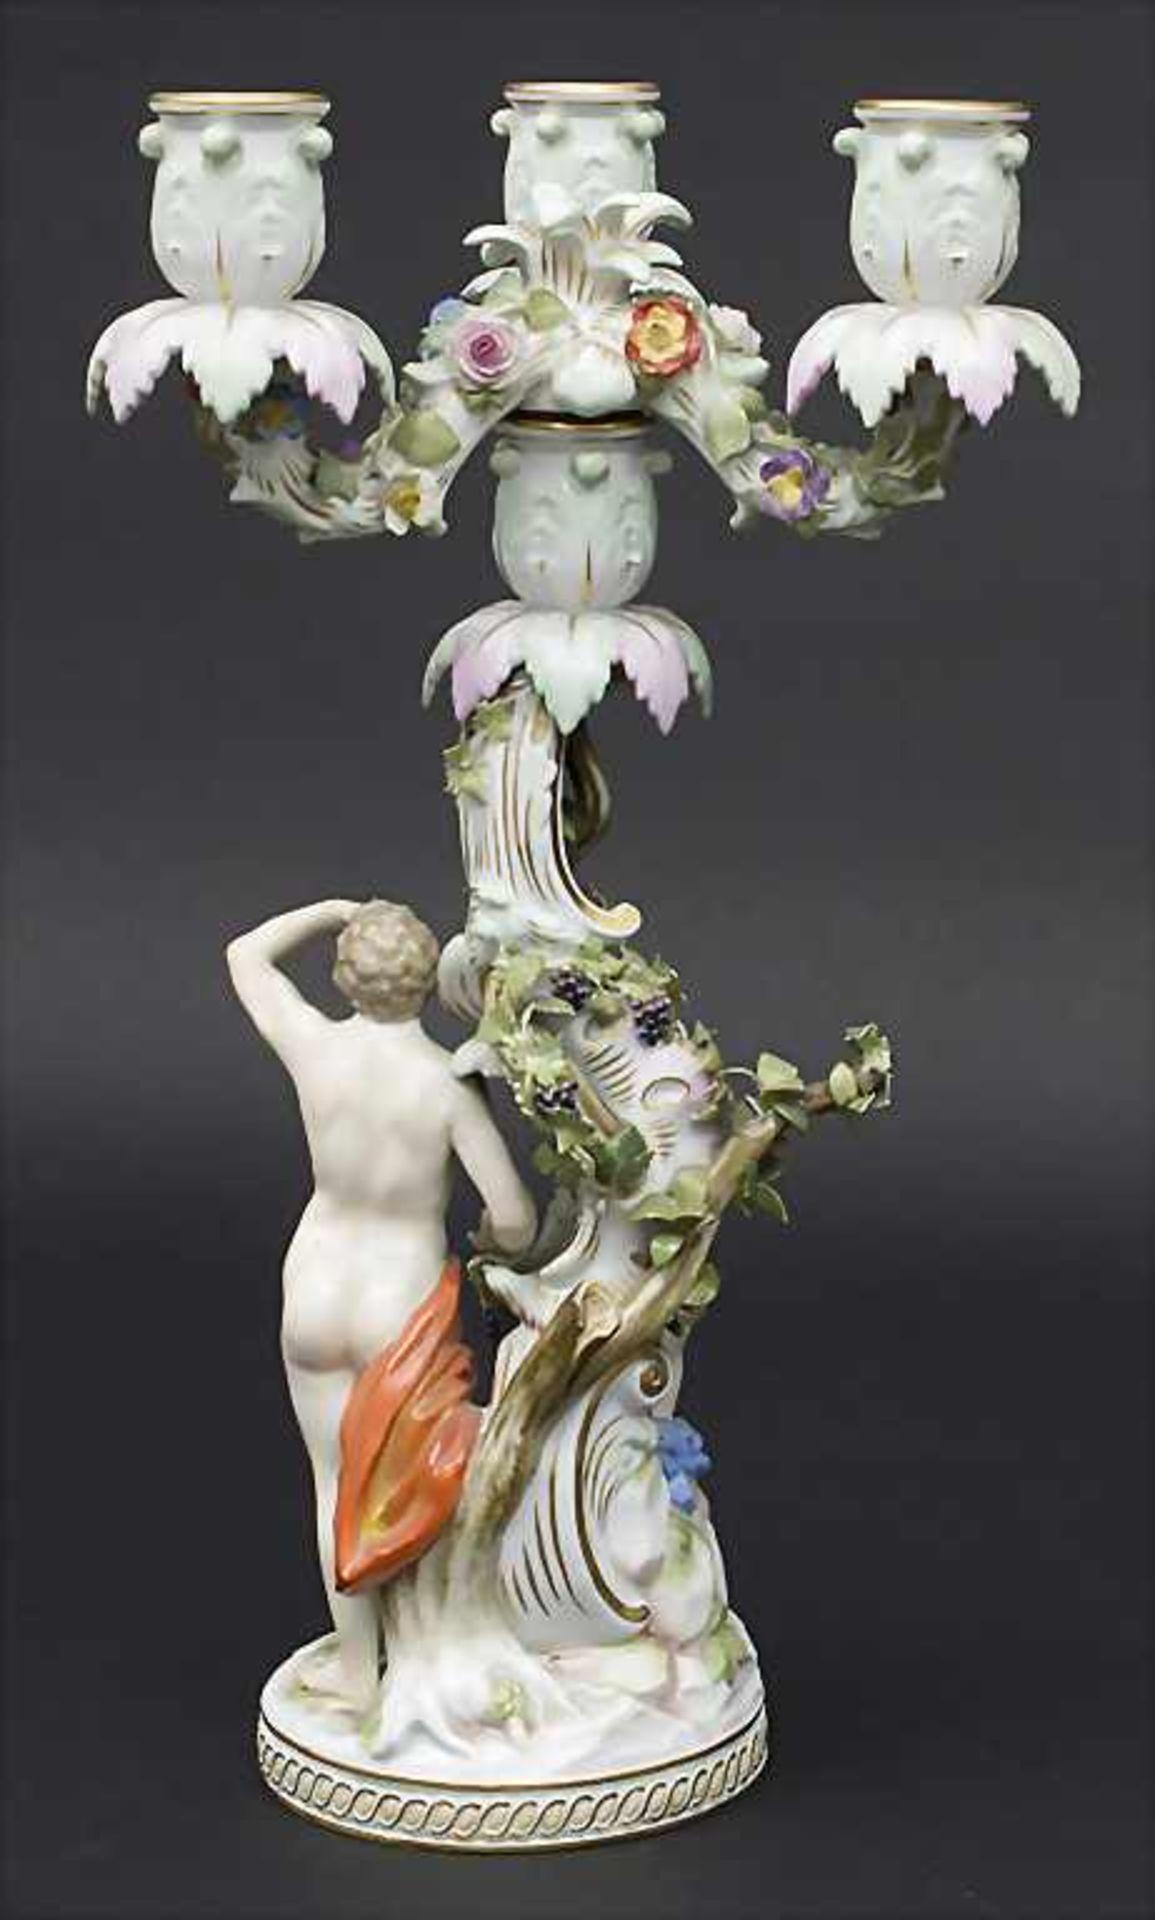 Dreiflammiger Leuchter Allegorie 'Der Herbst' / An allegorical candleholder 'The Autumn', Meissen, - Bild 3 aus 9